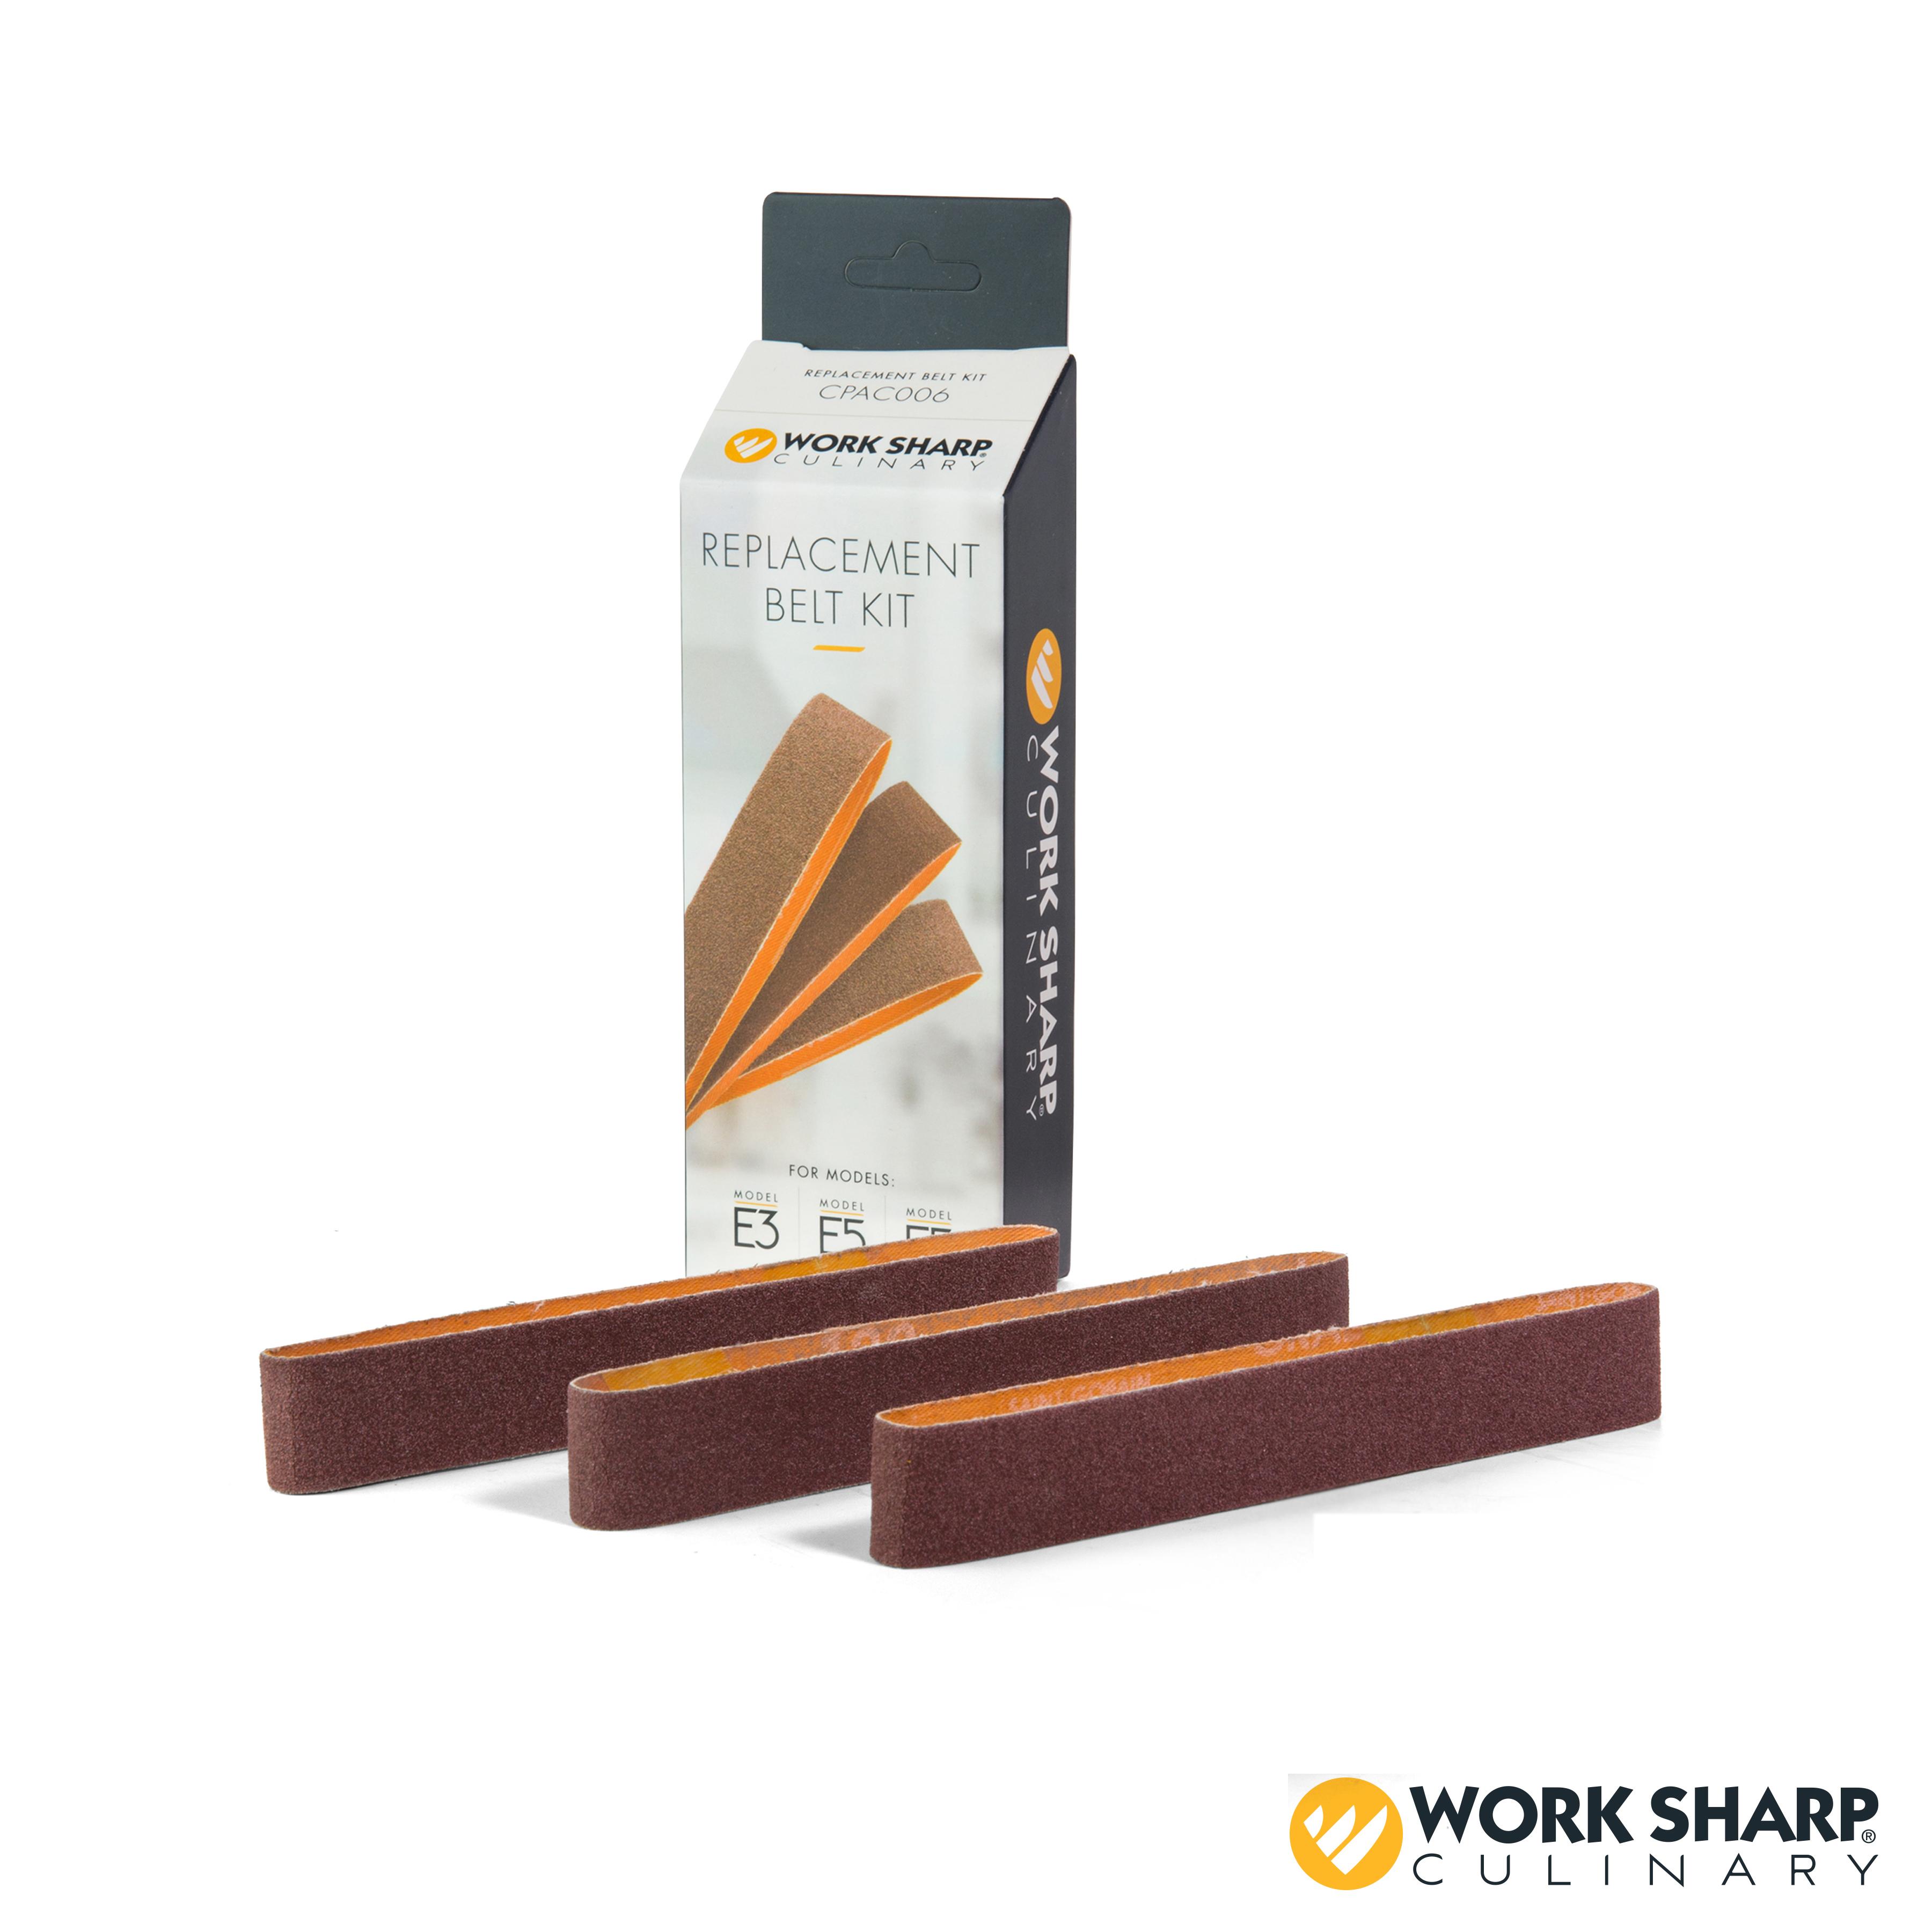 Work Sharp Culinary E5 Electric Kitchen Knife Sharpener Replacement Belt Kit